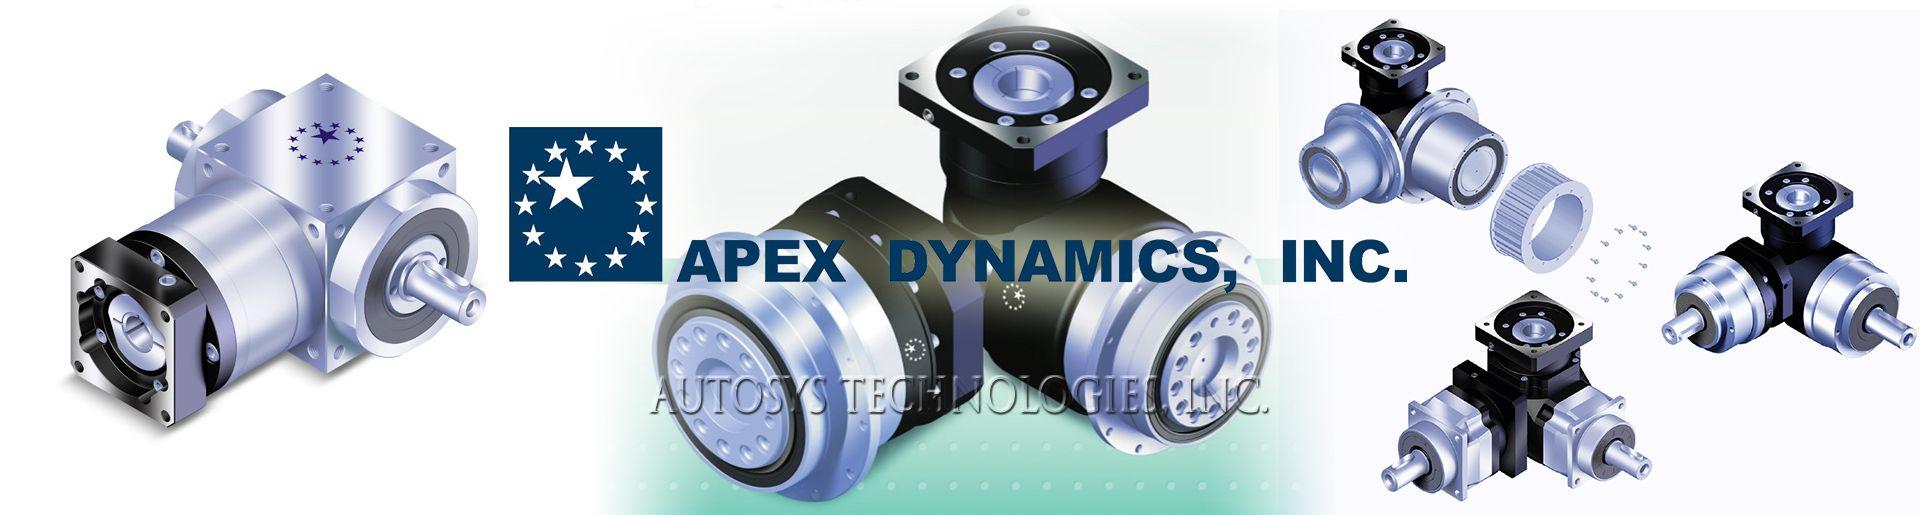 APEX TECHNOLOGY GROUP, INC - bizapediacom